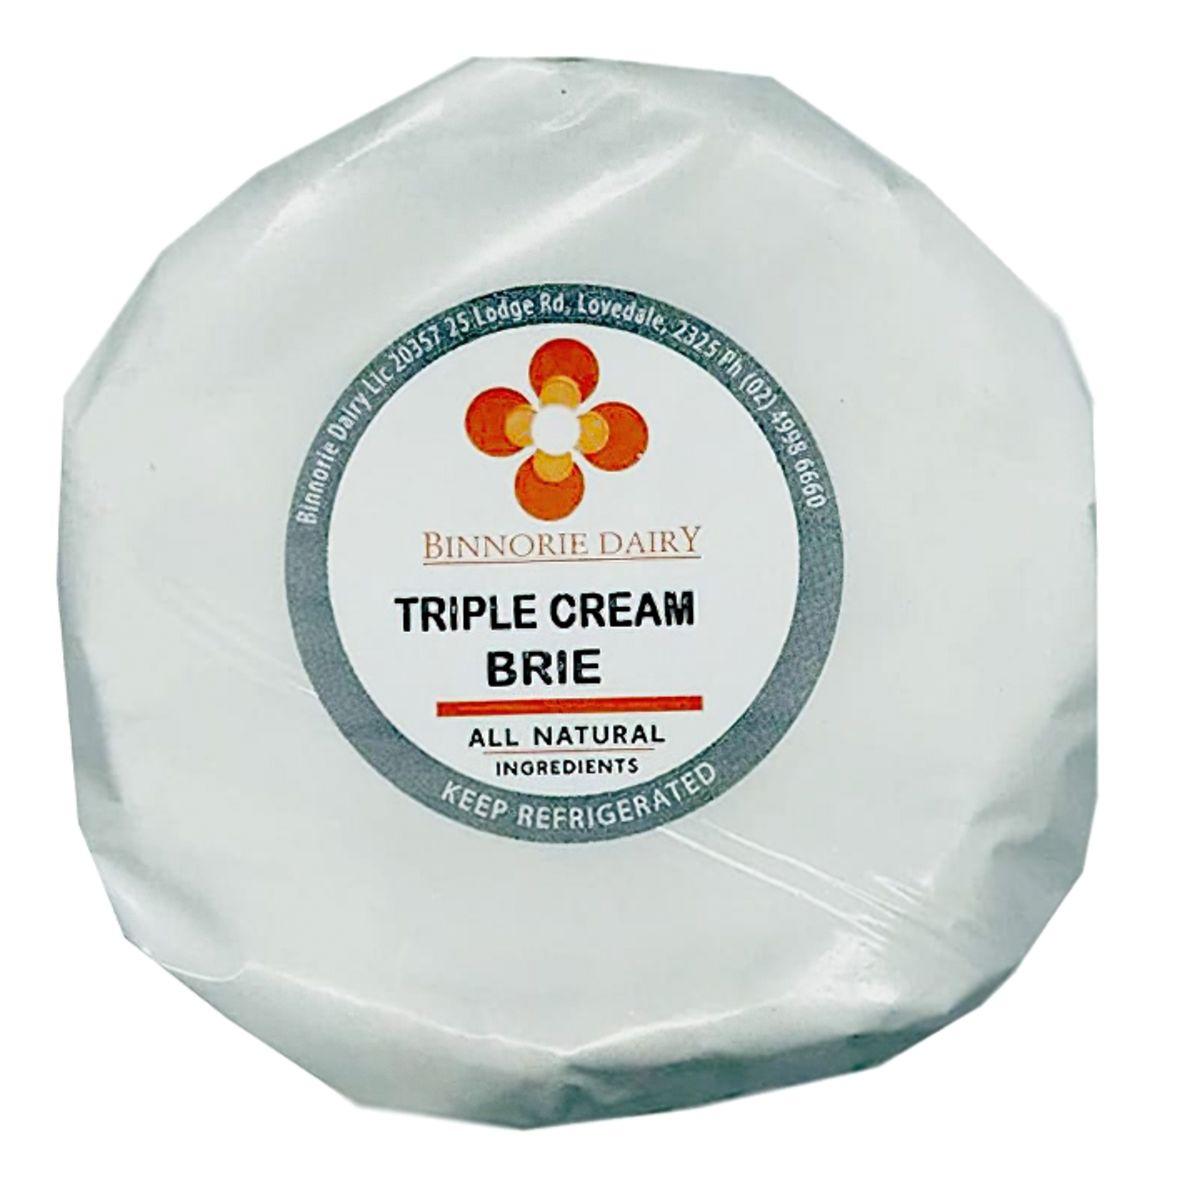 Binnorie Dairy - Brie - Triple Cream